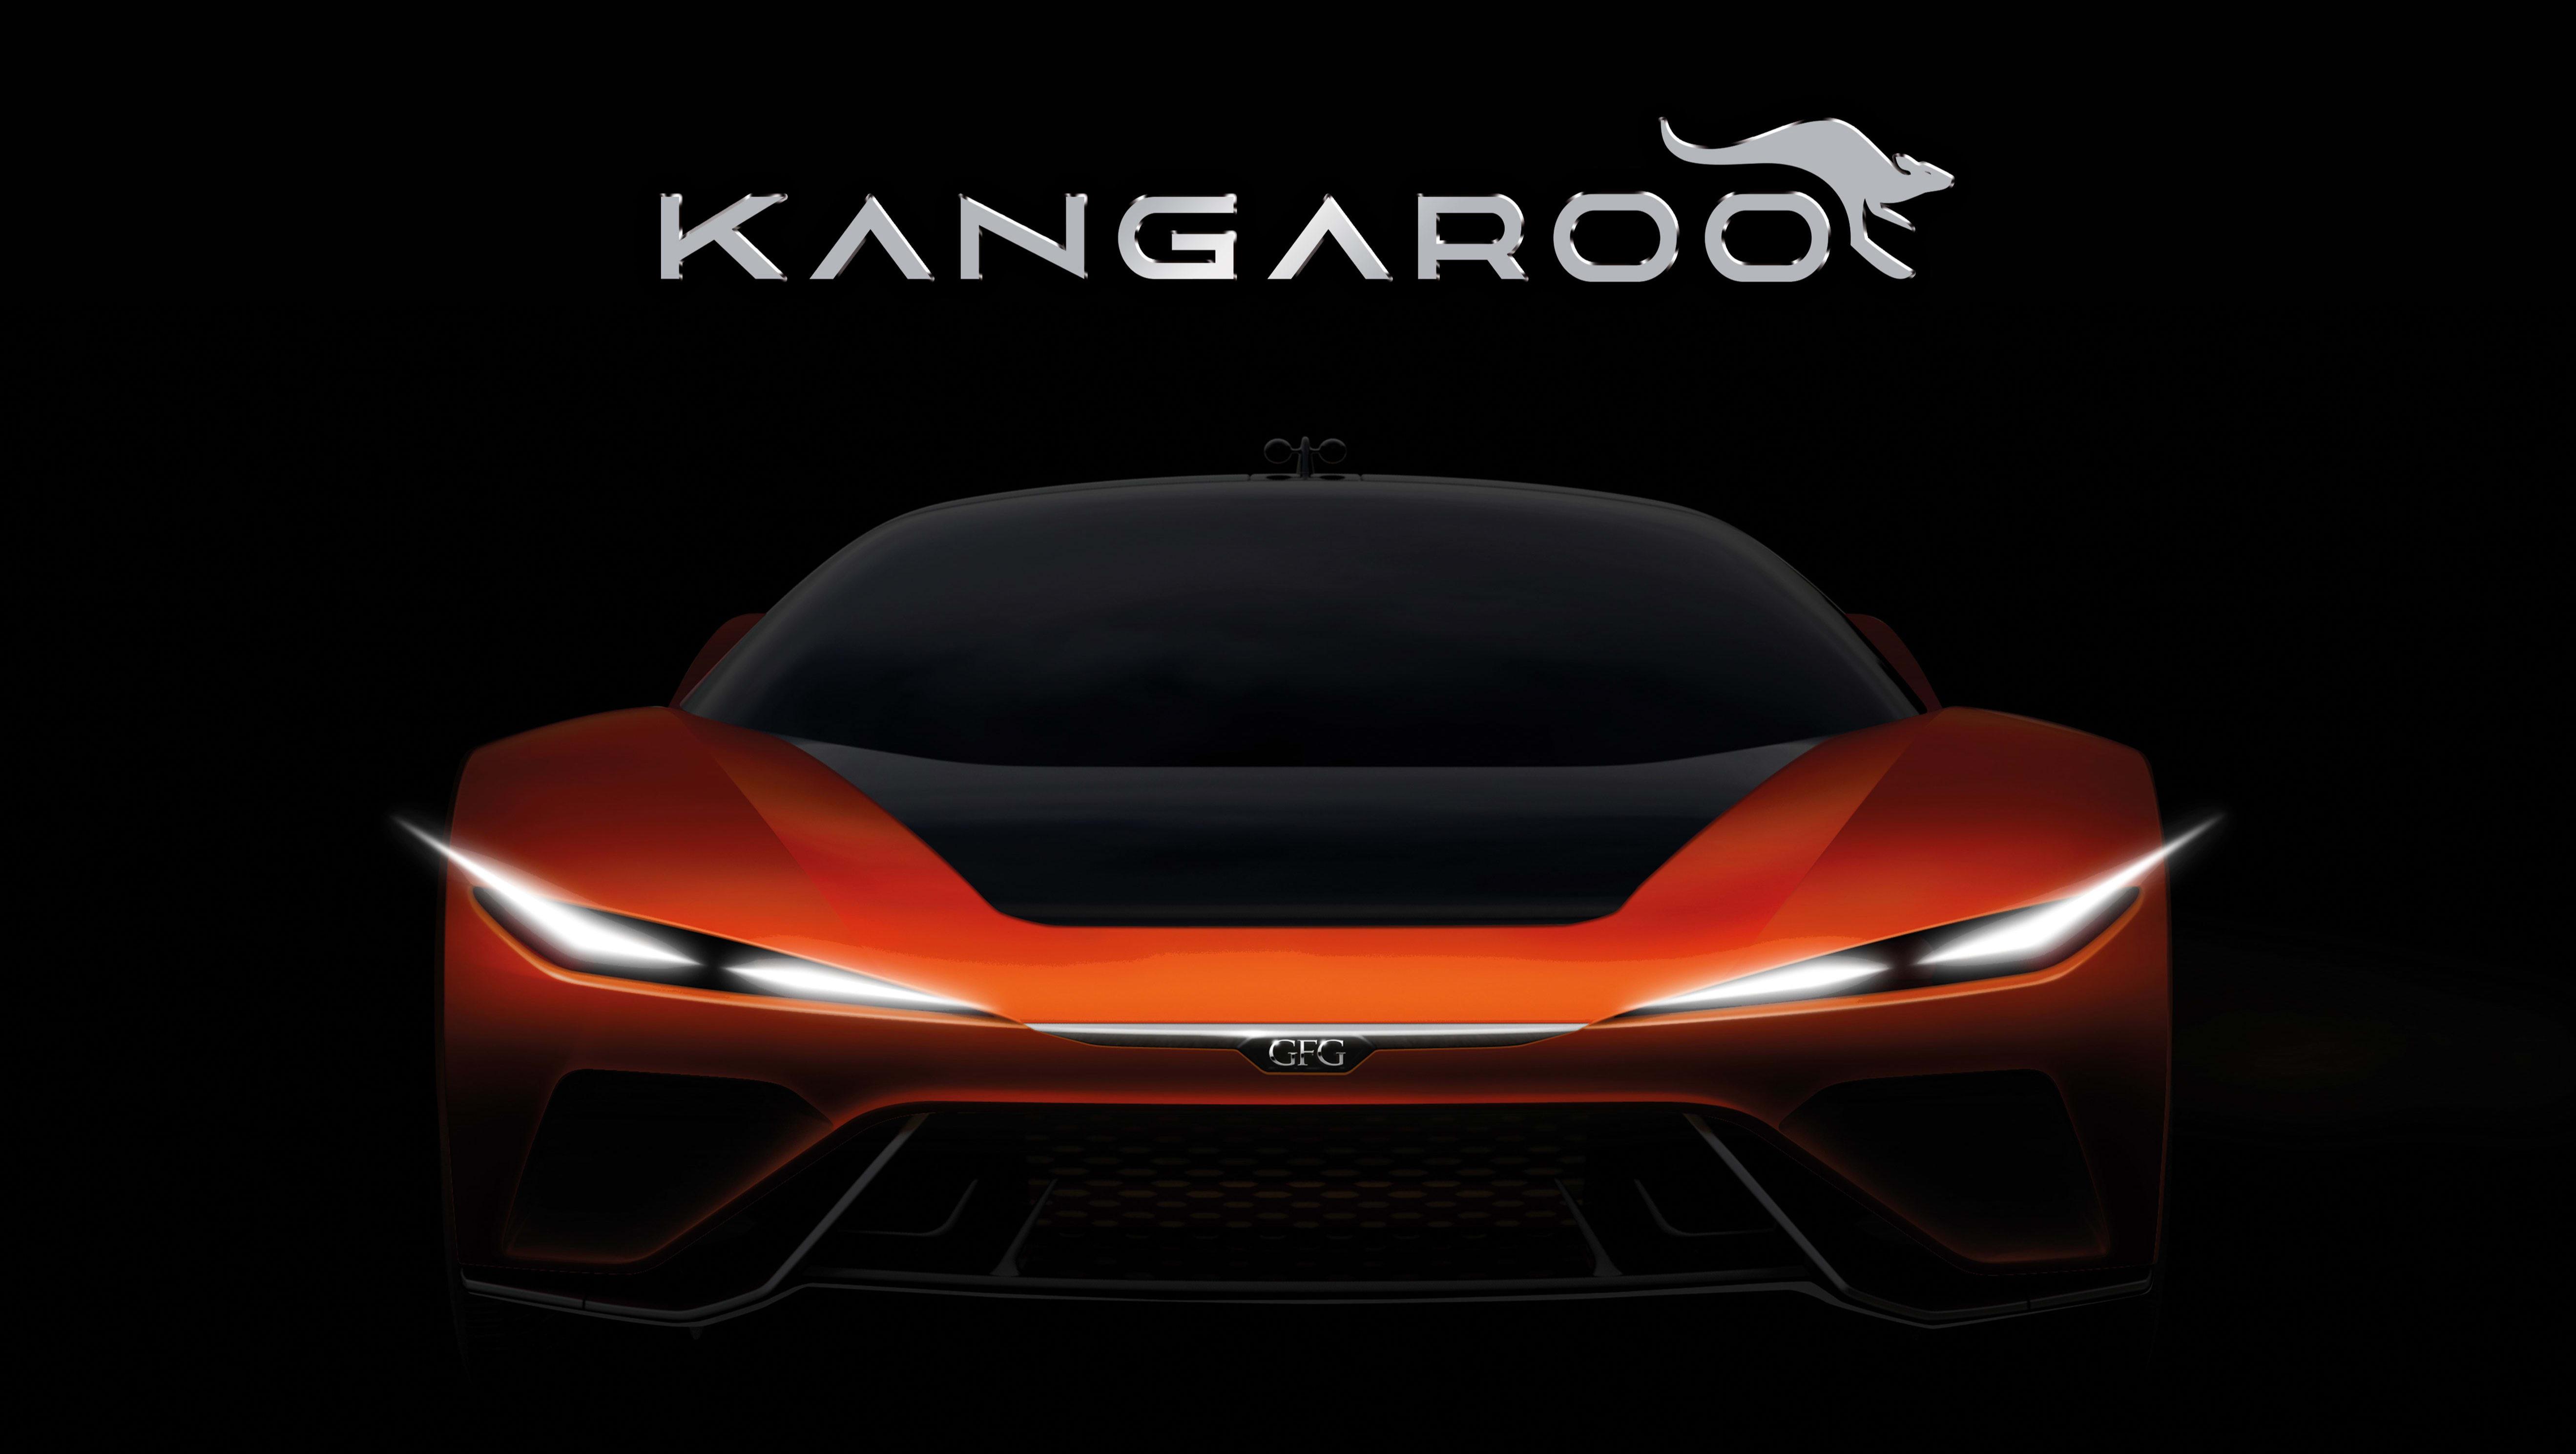 GFG Style Kangaroo Concept: the hyper-SUV with an Australian twist